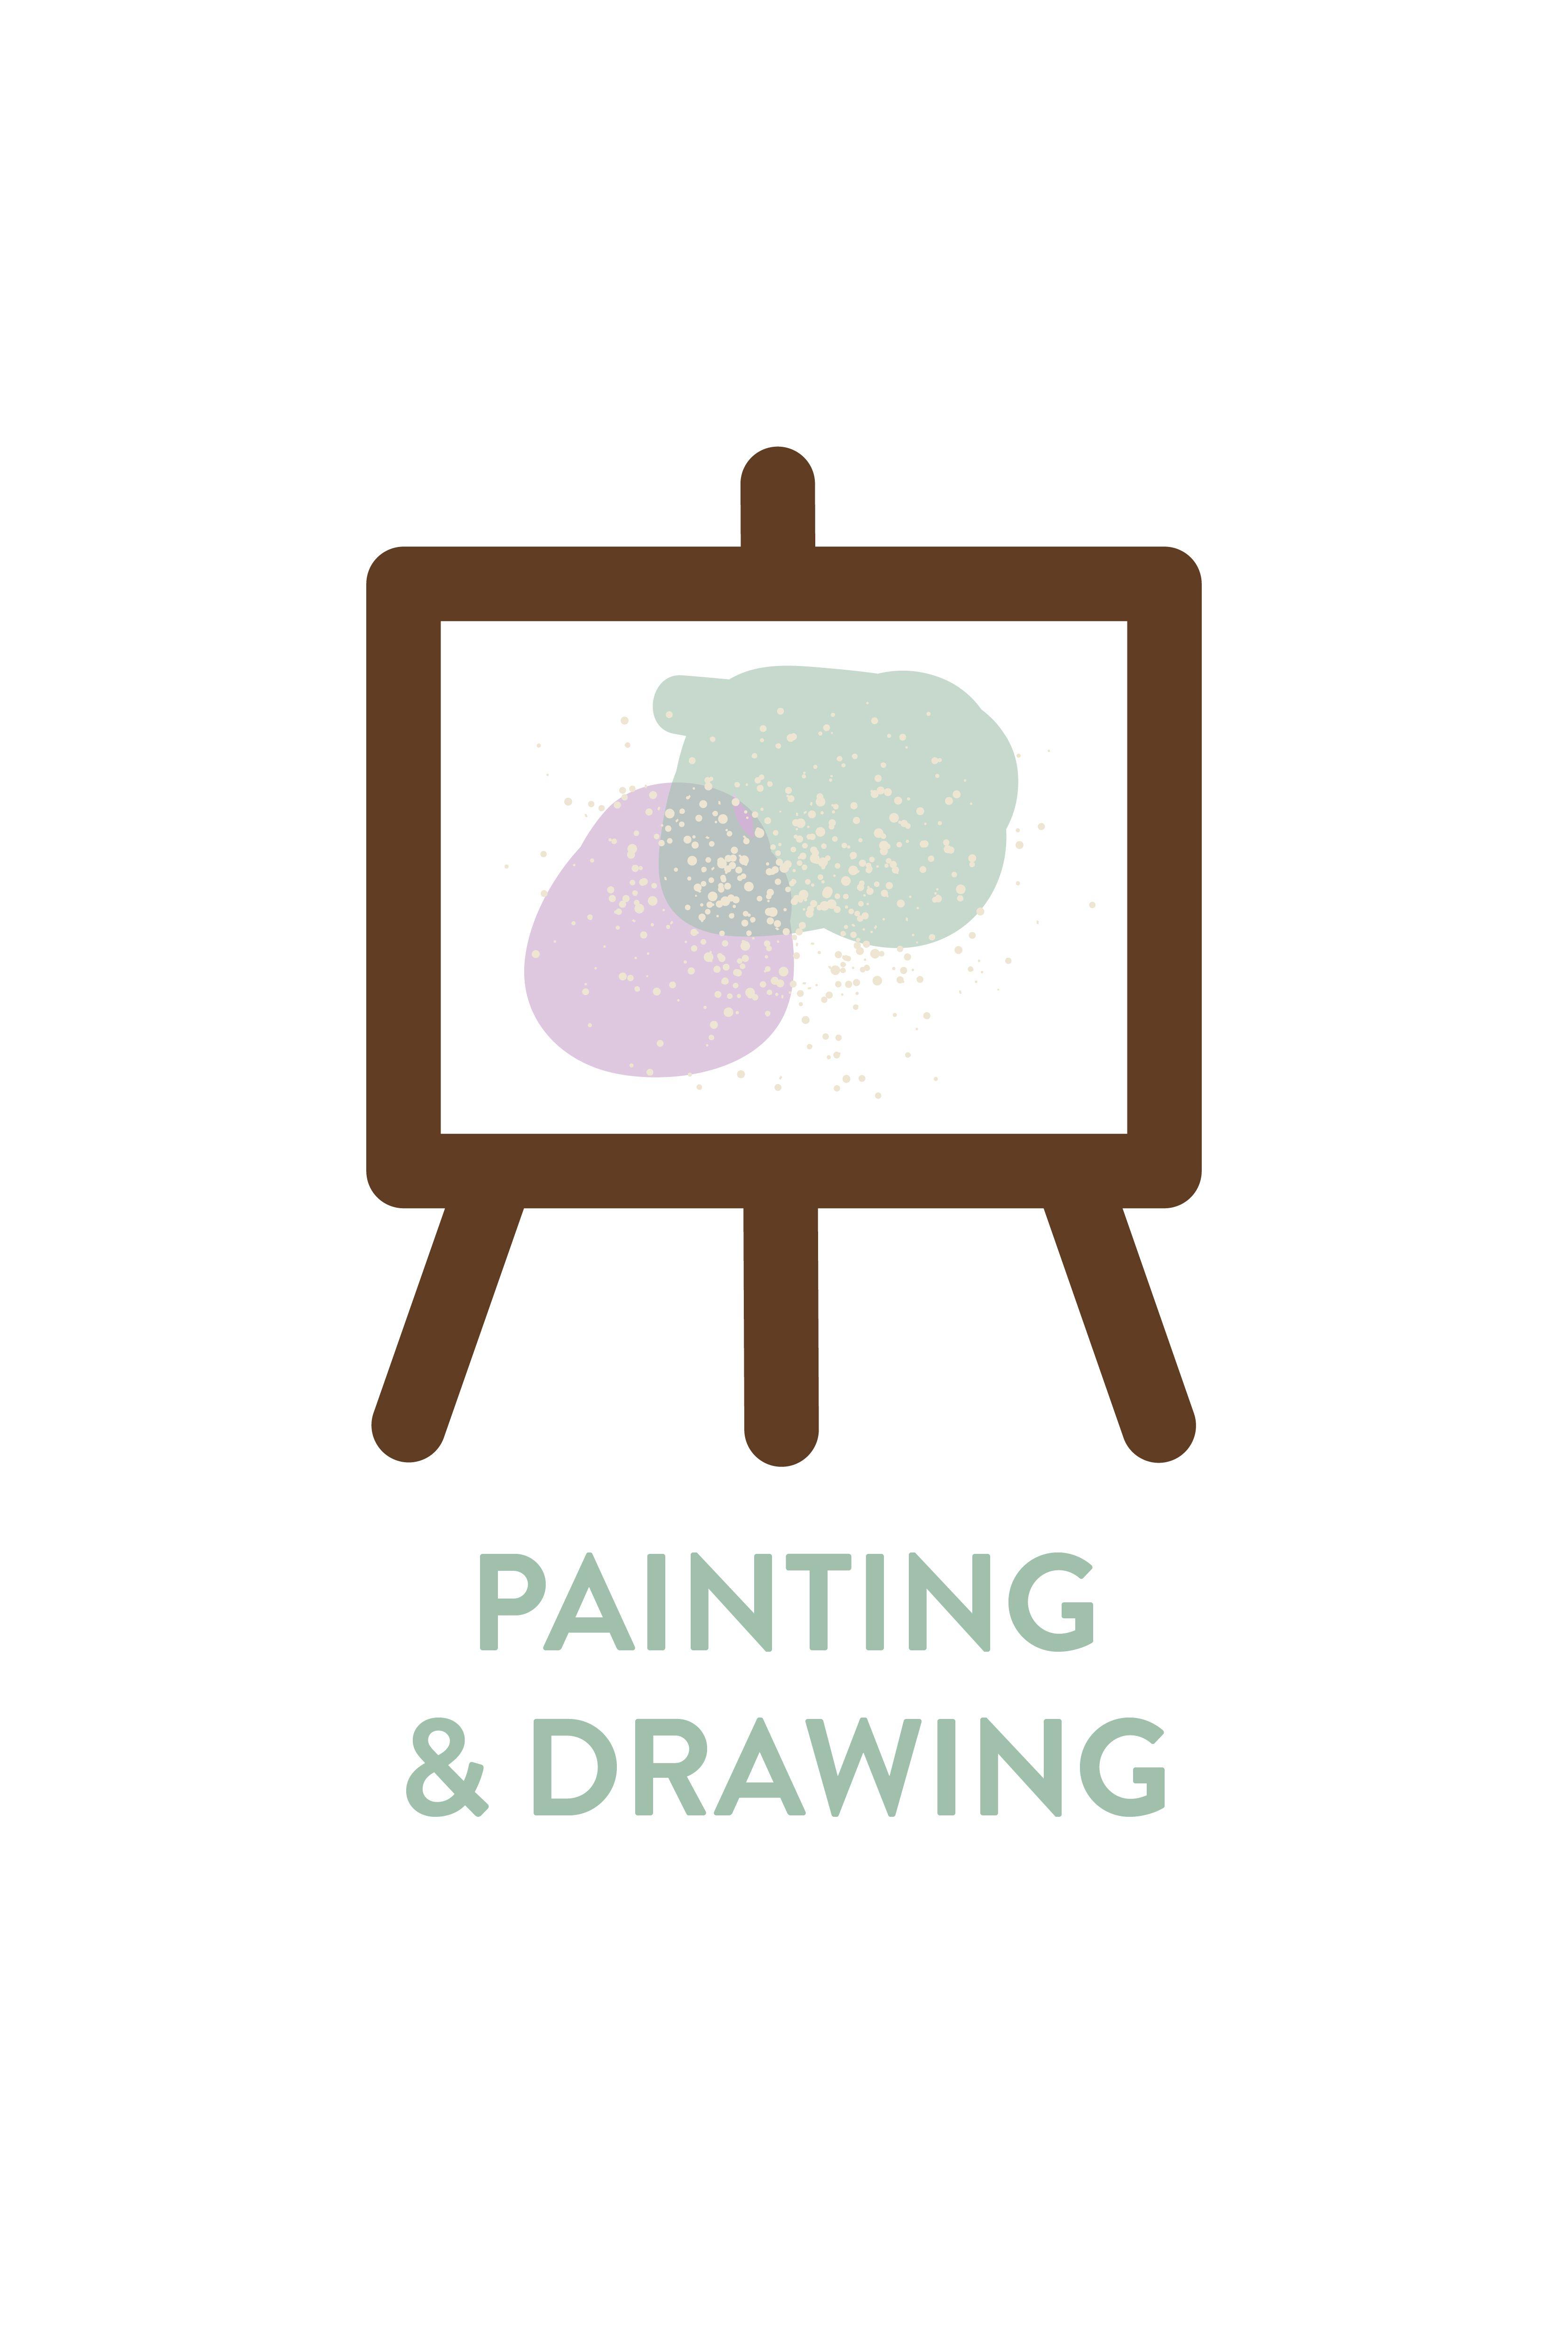 Painting & Drawing Icon | Resume Branding | Graphic Designer ...